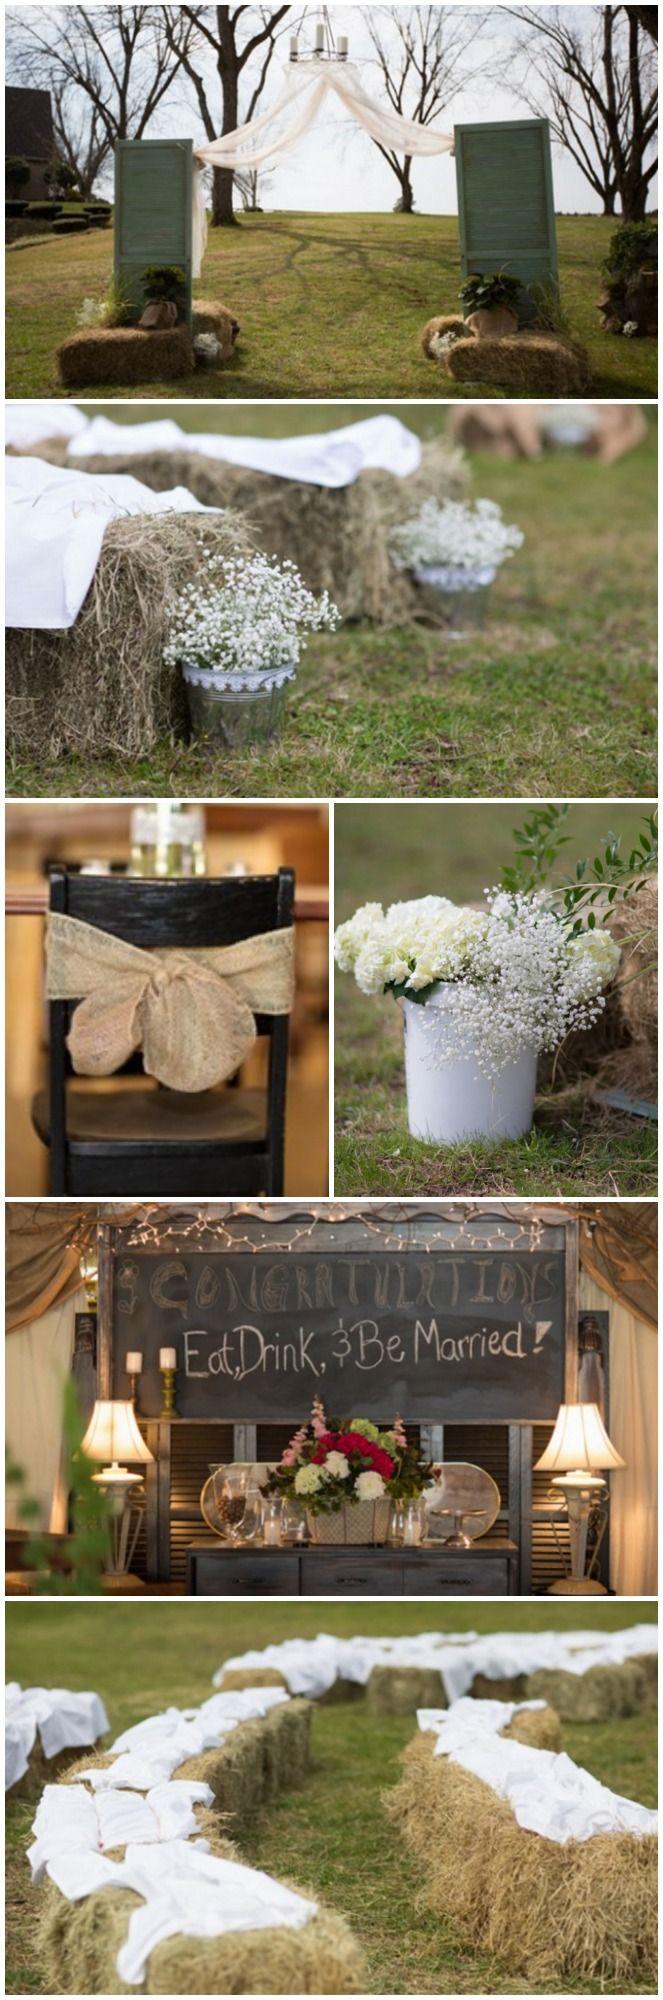 Ideas for a farm wedding!